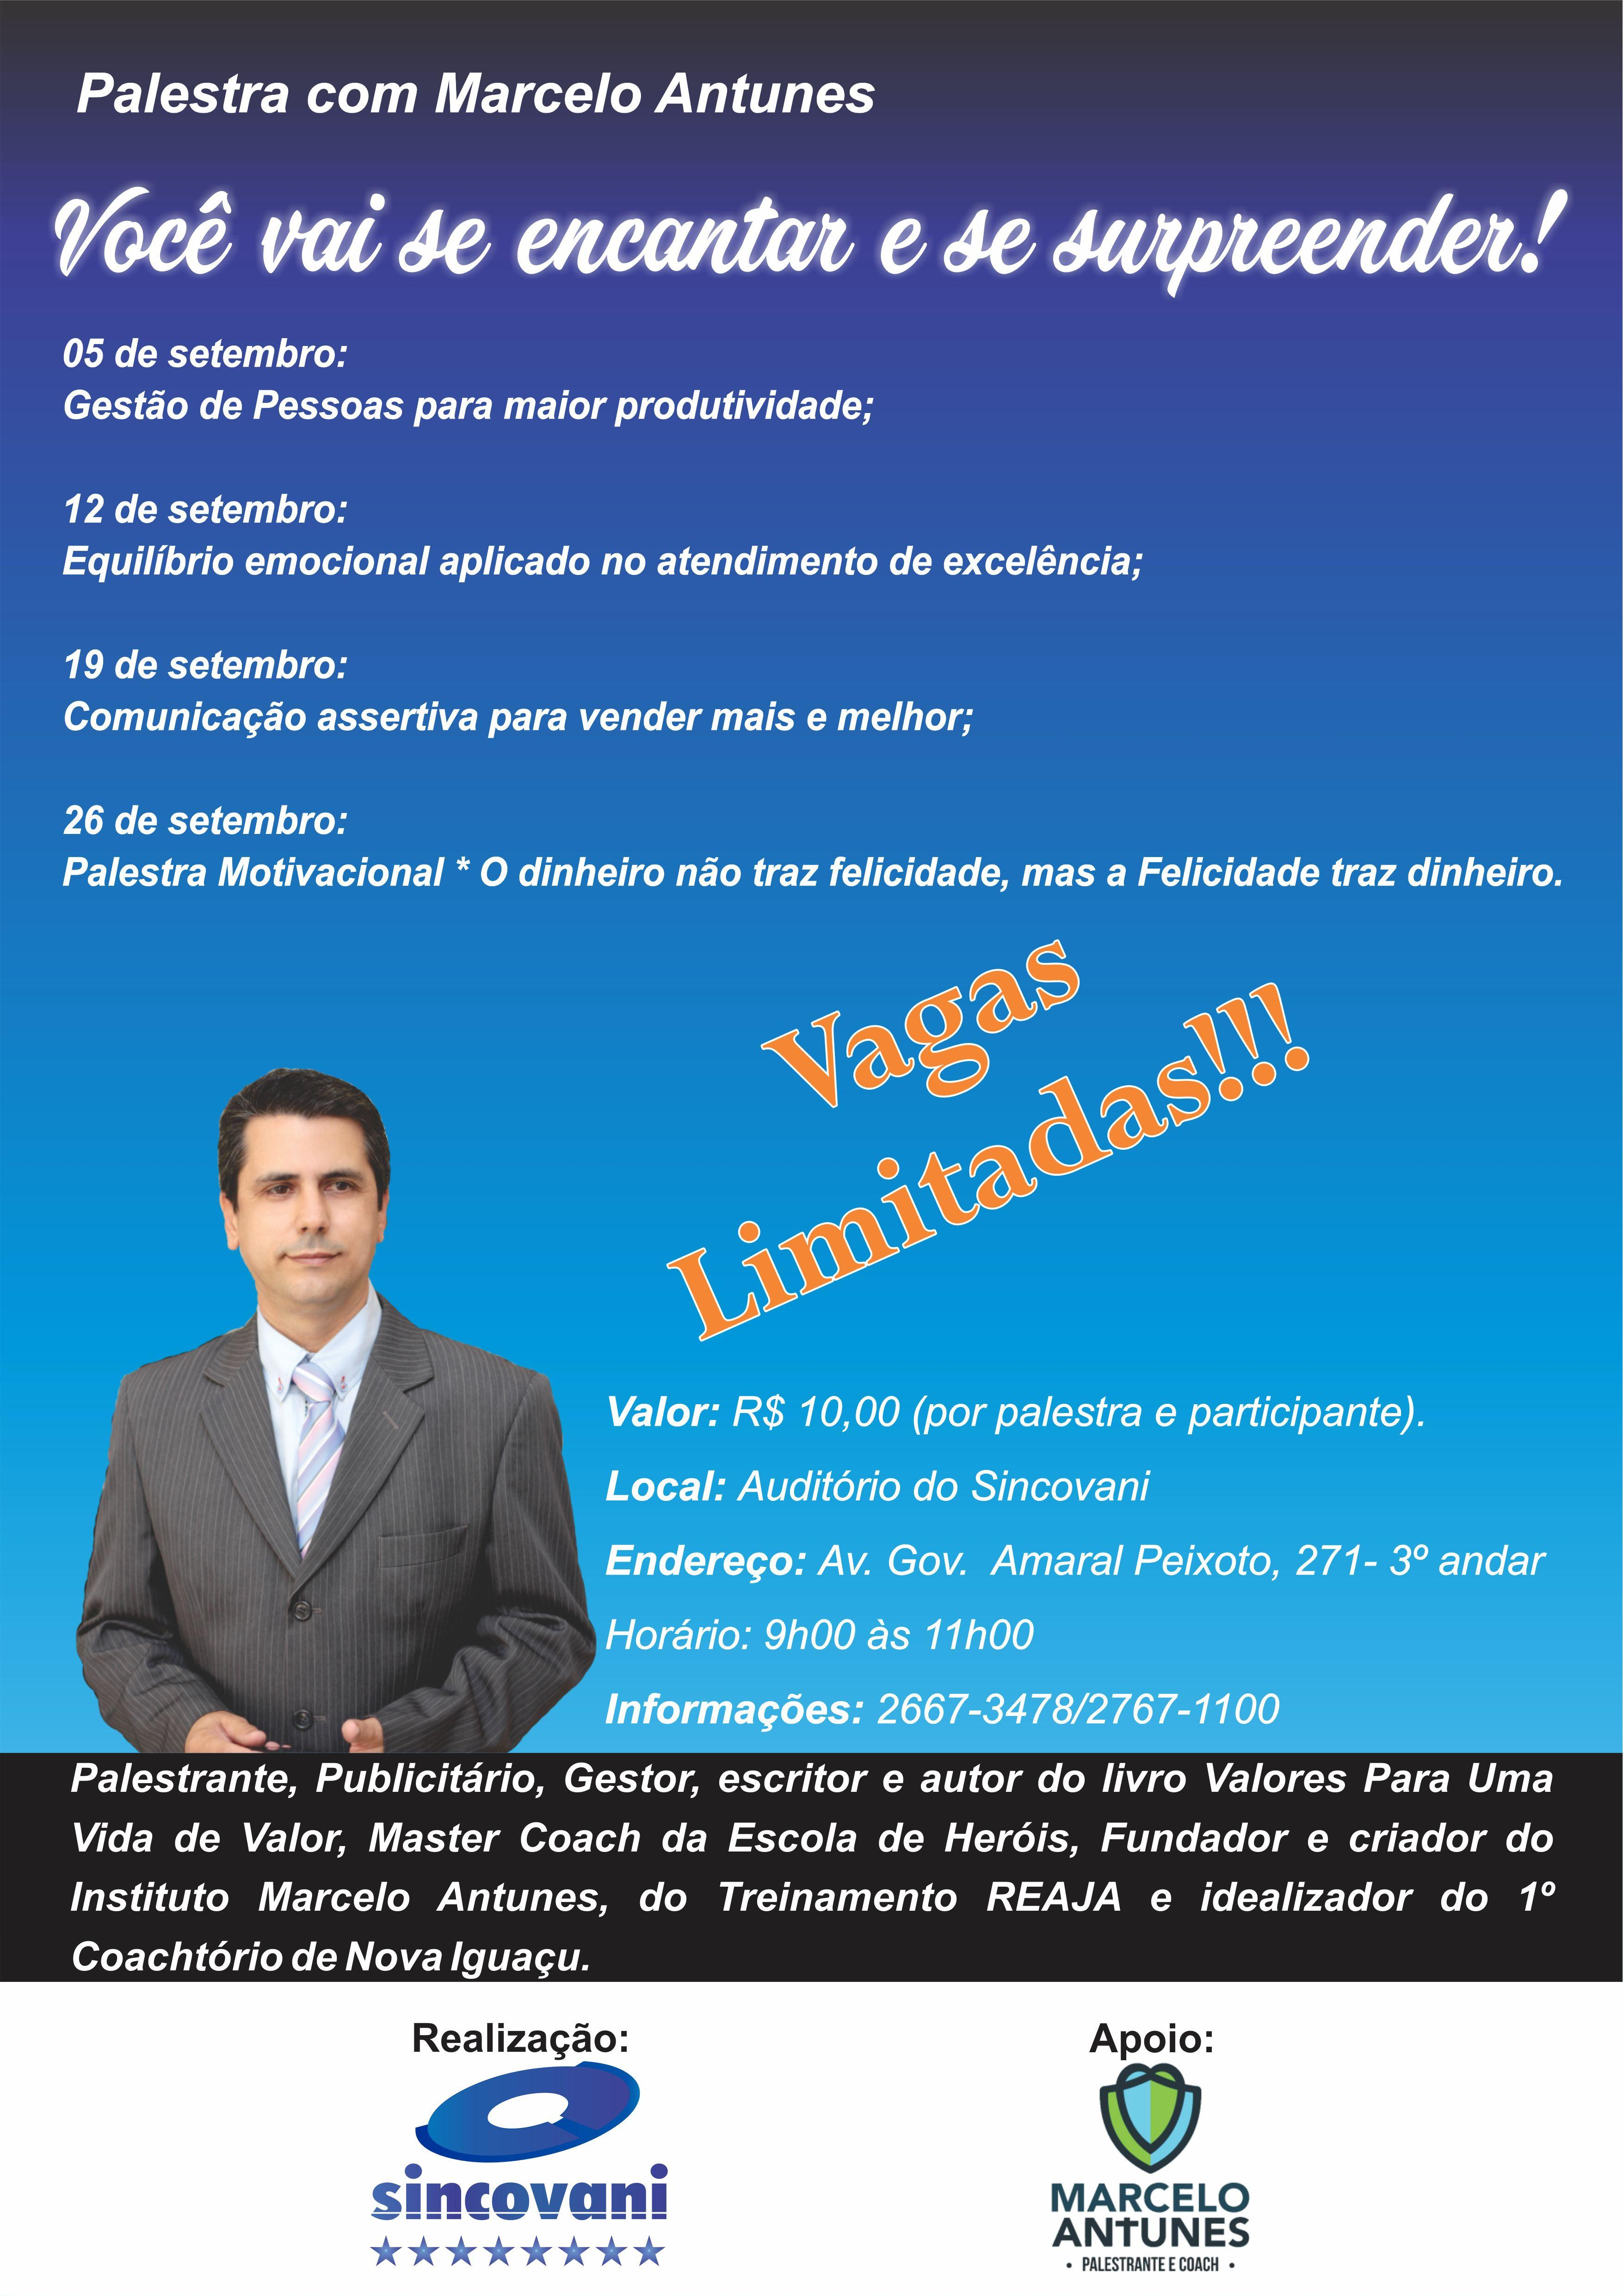 Palestra com Marcelo Antunes